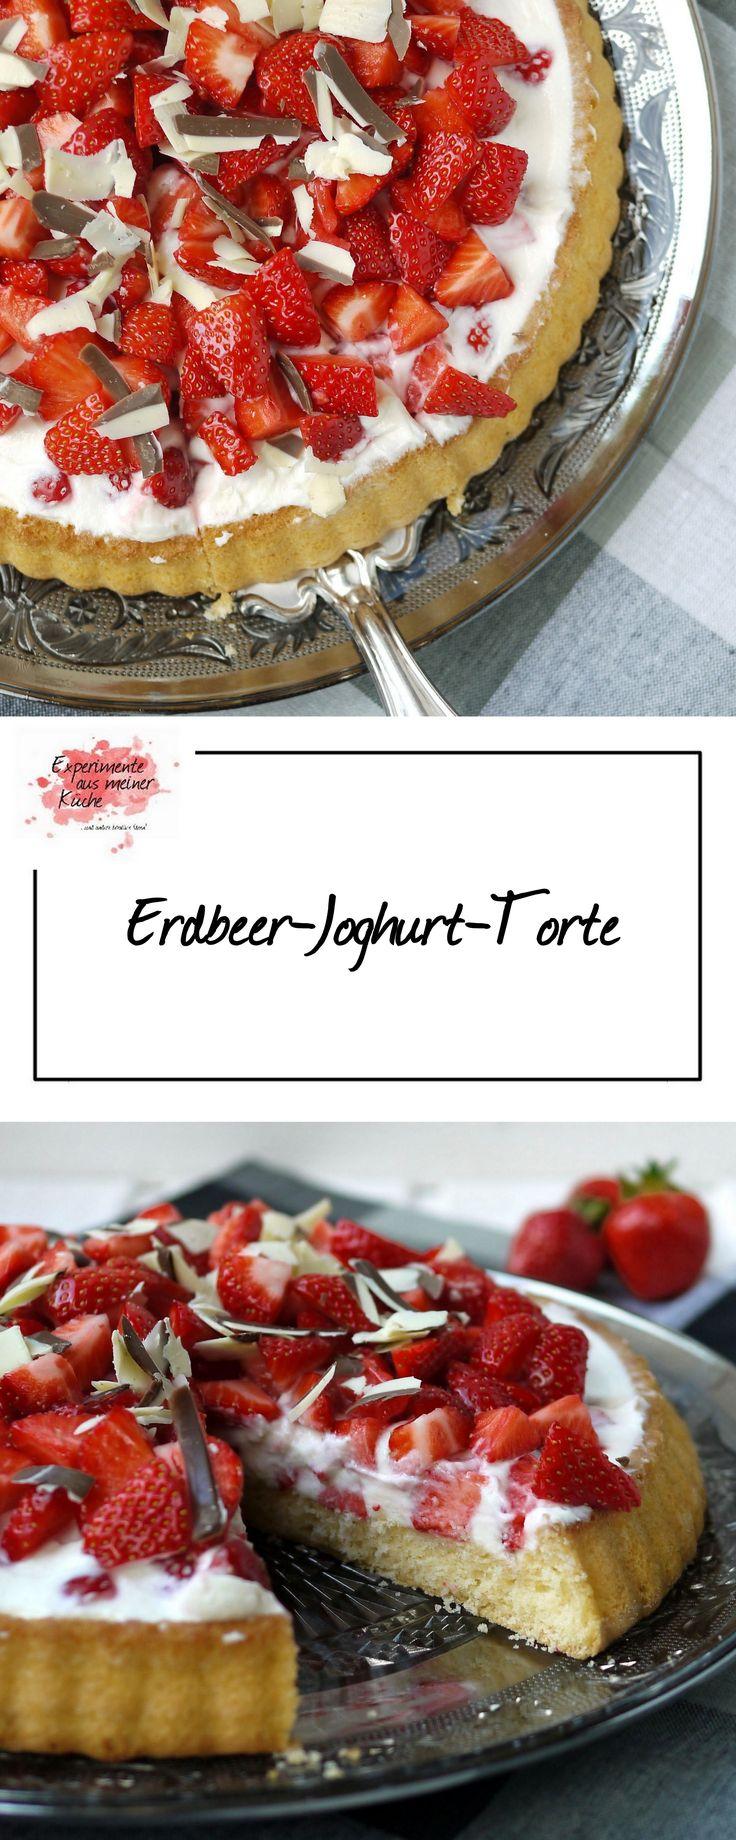 Erdbeer-Joghurt-Torte | Backen | Rezept | Kuchen